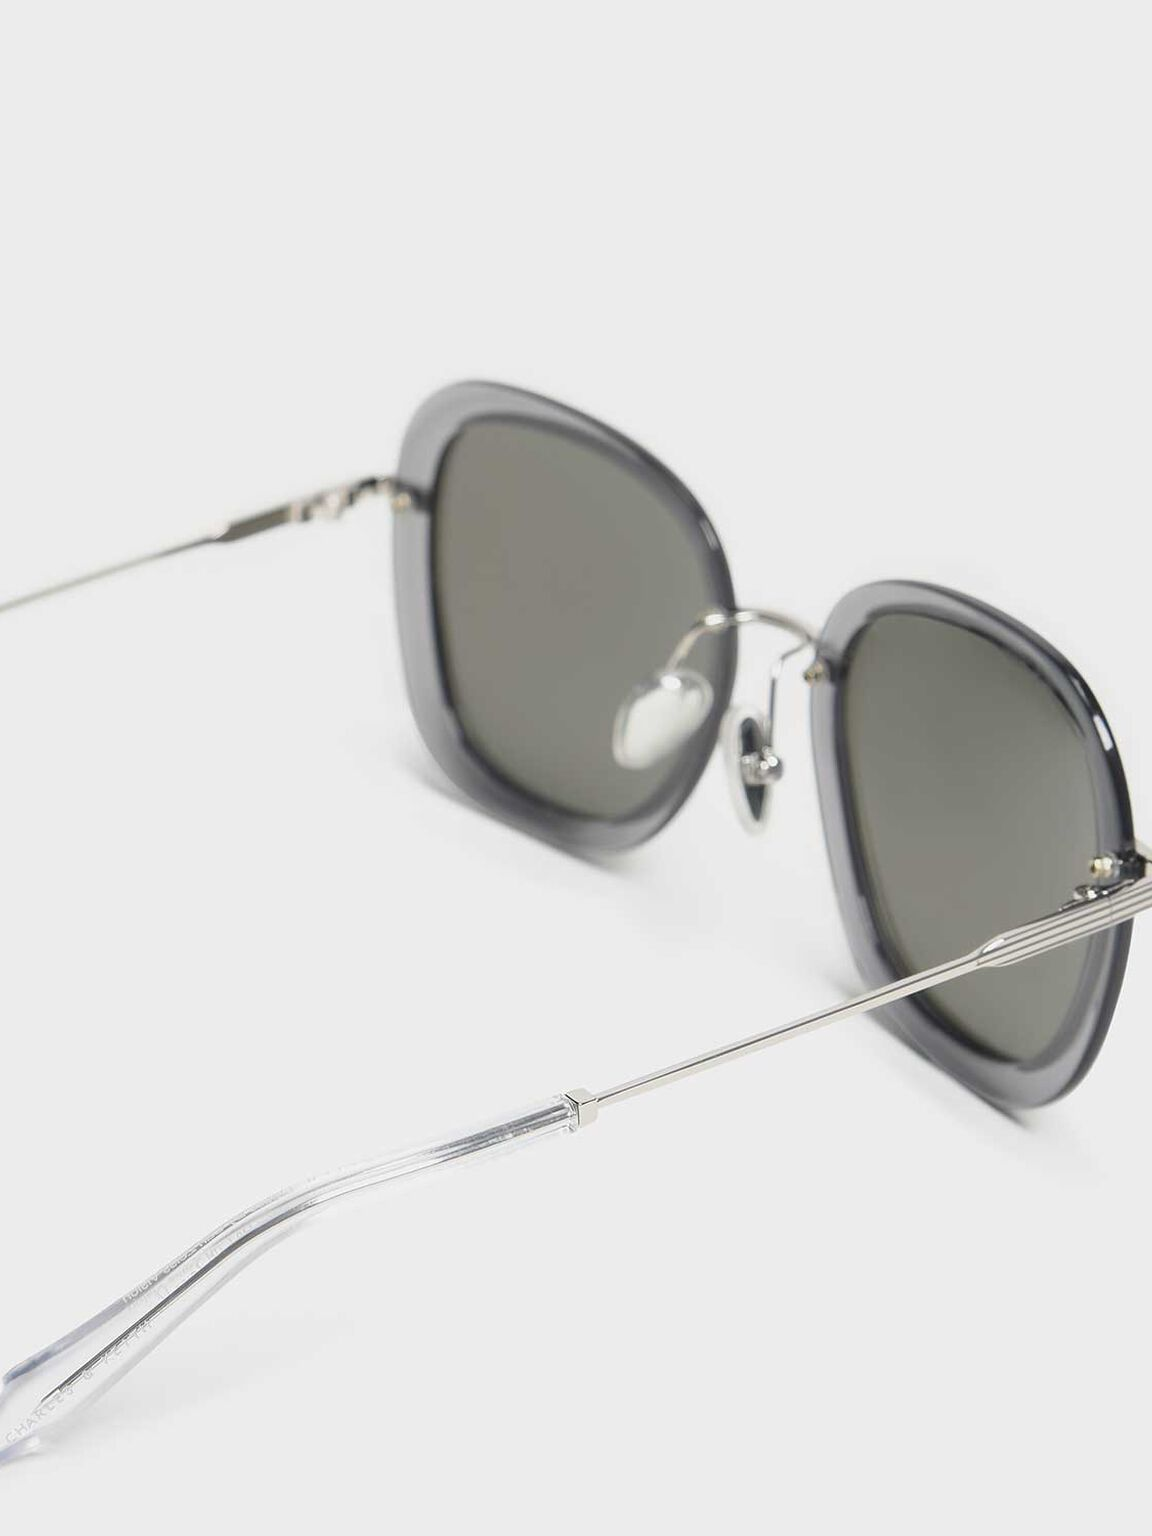 Double Lens Sunglasses, Silver, hi-res